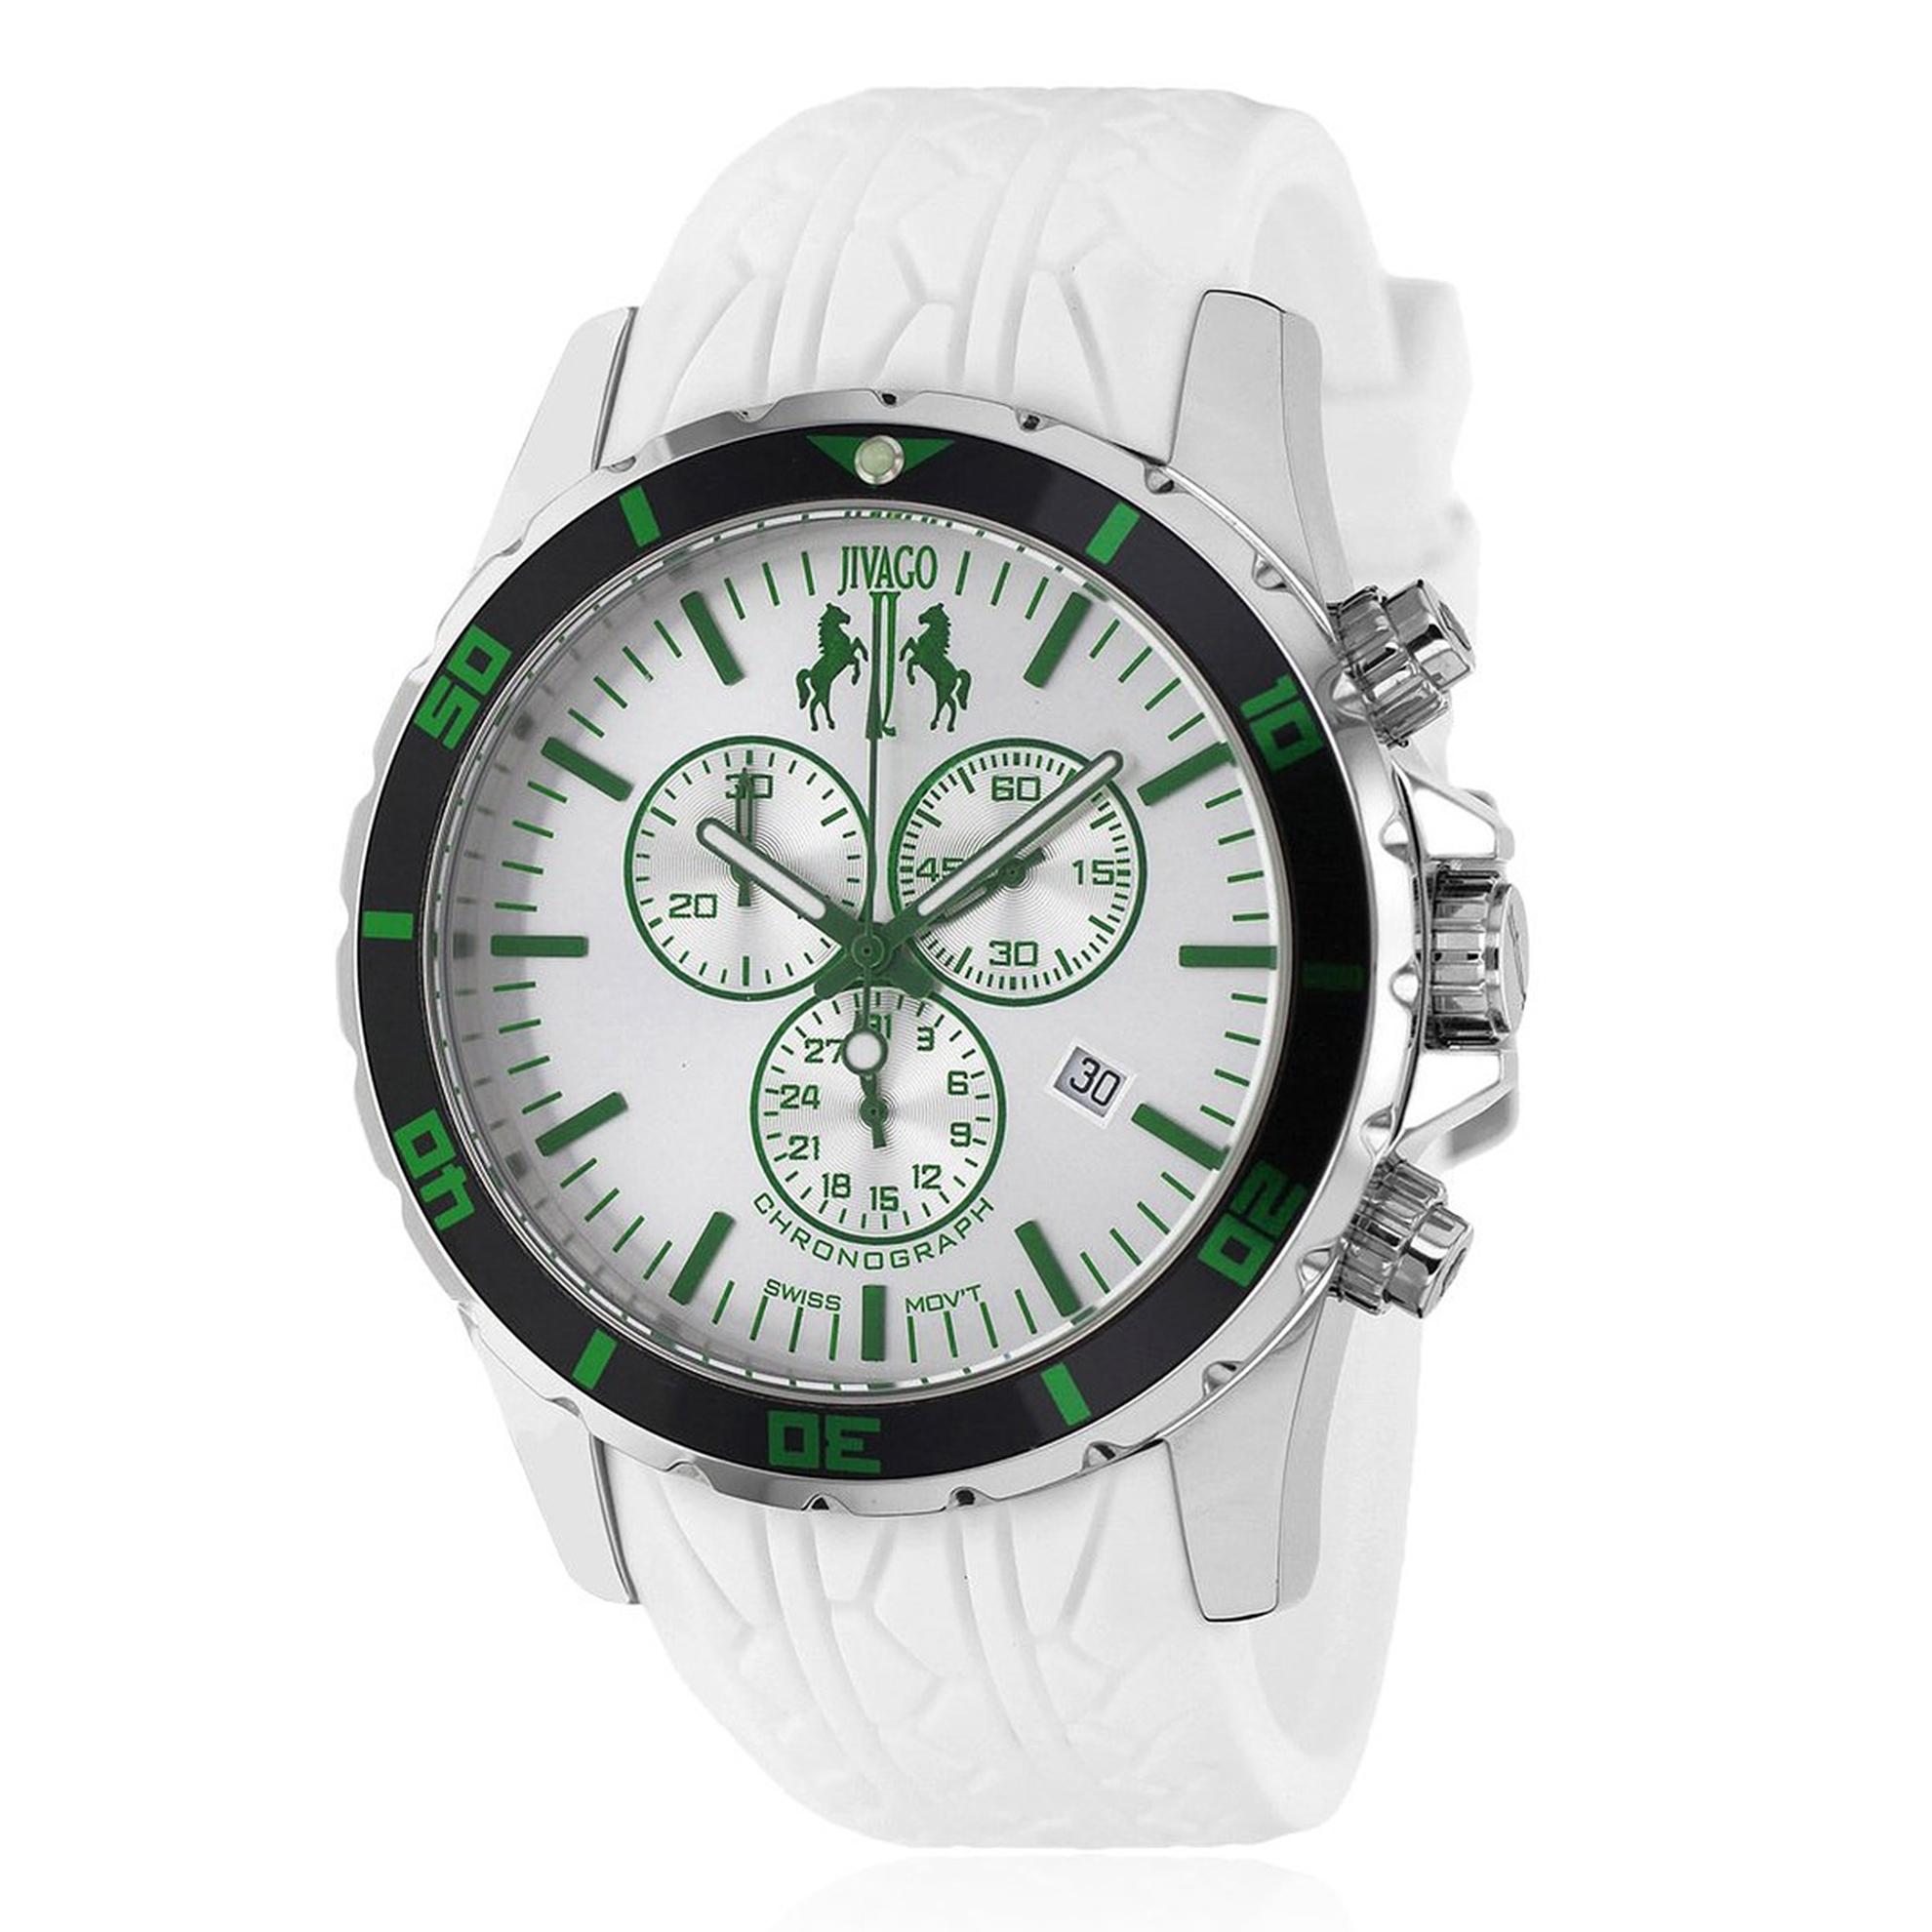 Jivago JV0126 Jivago Men's Ultimate Sport Chronograph White/Green White Rubber Strap